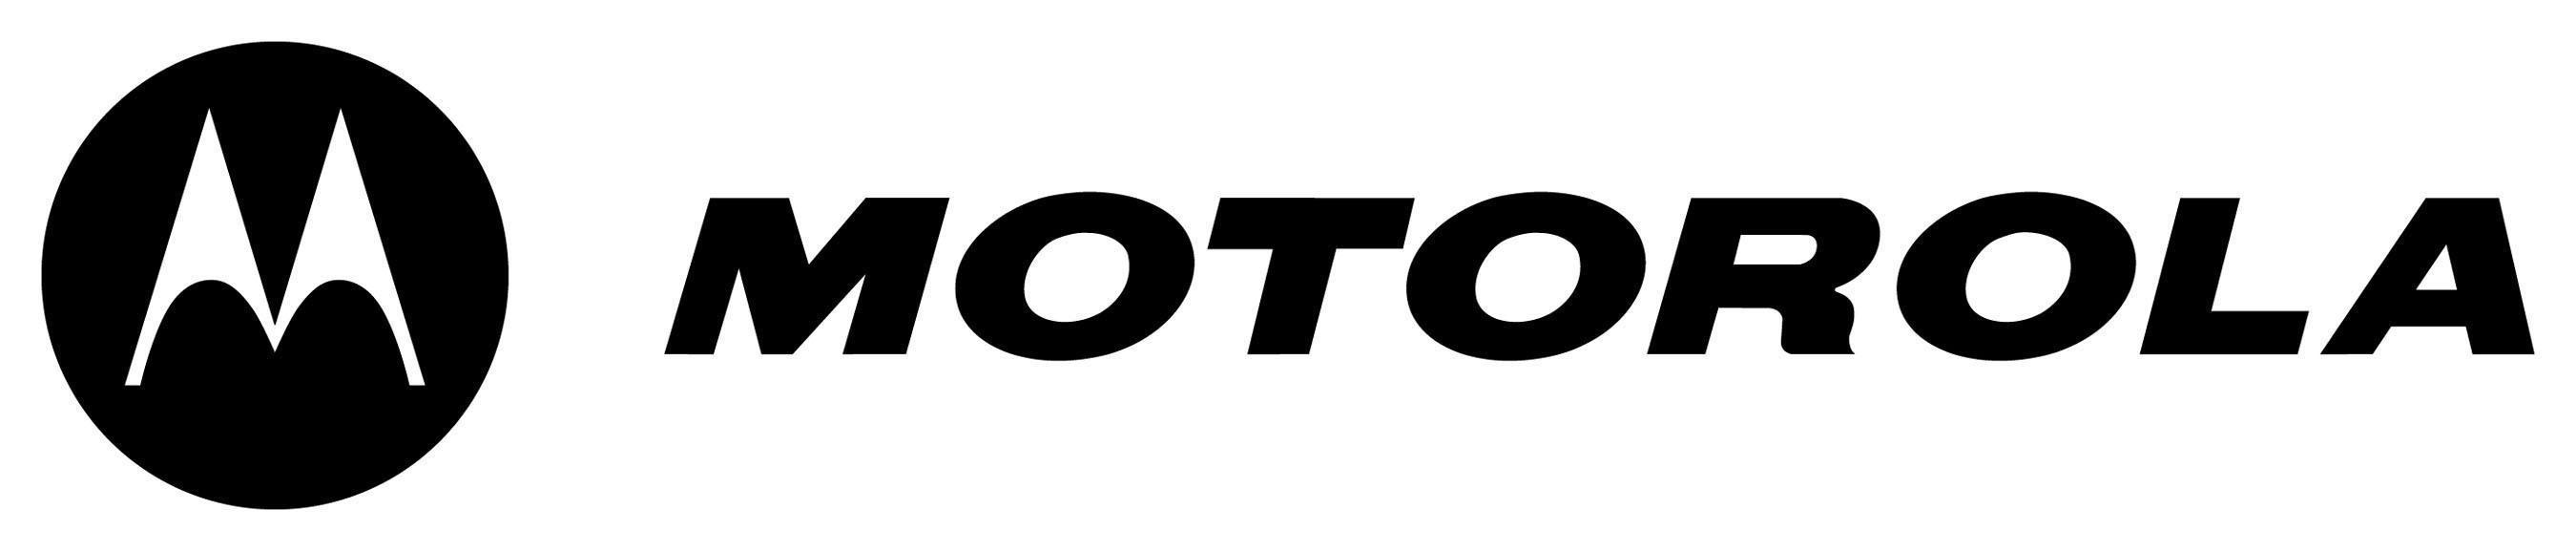 Motorola | RootJunky com